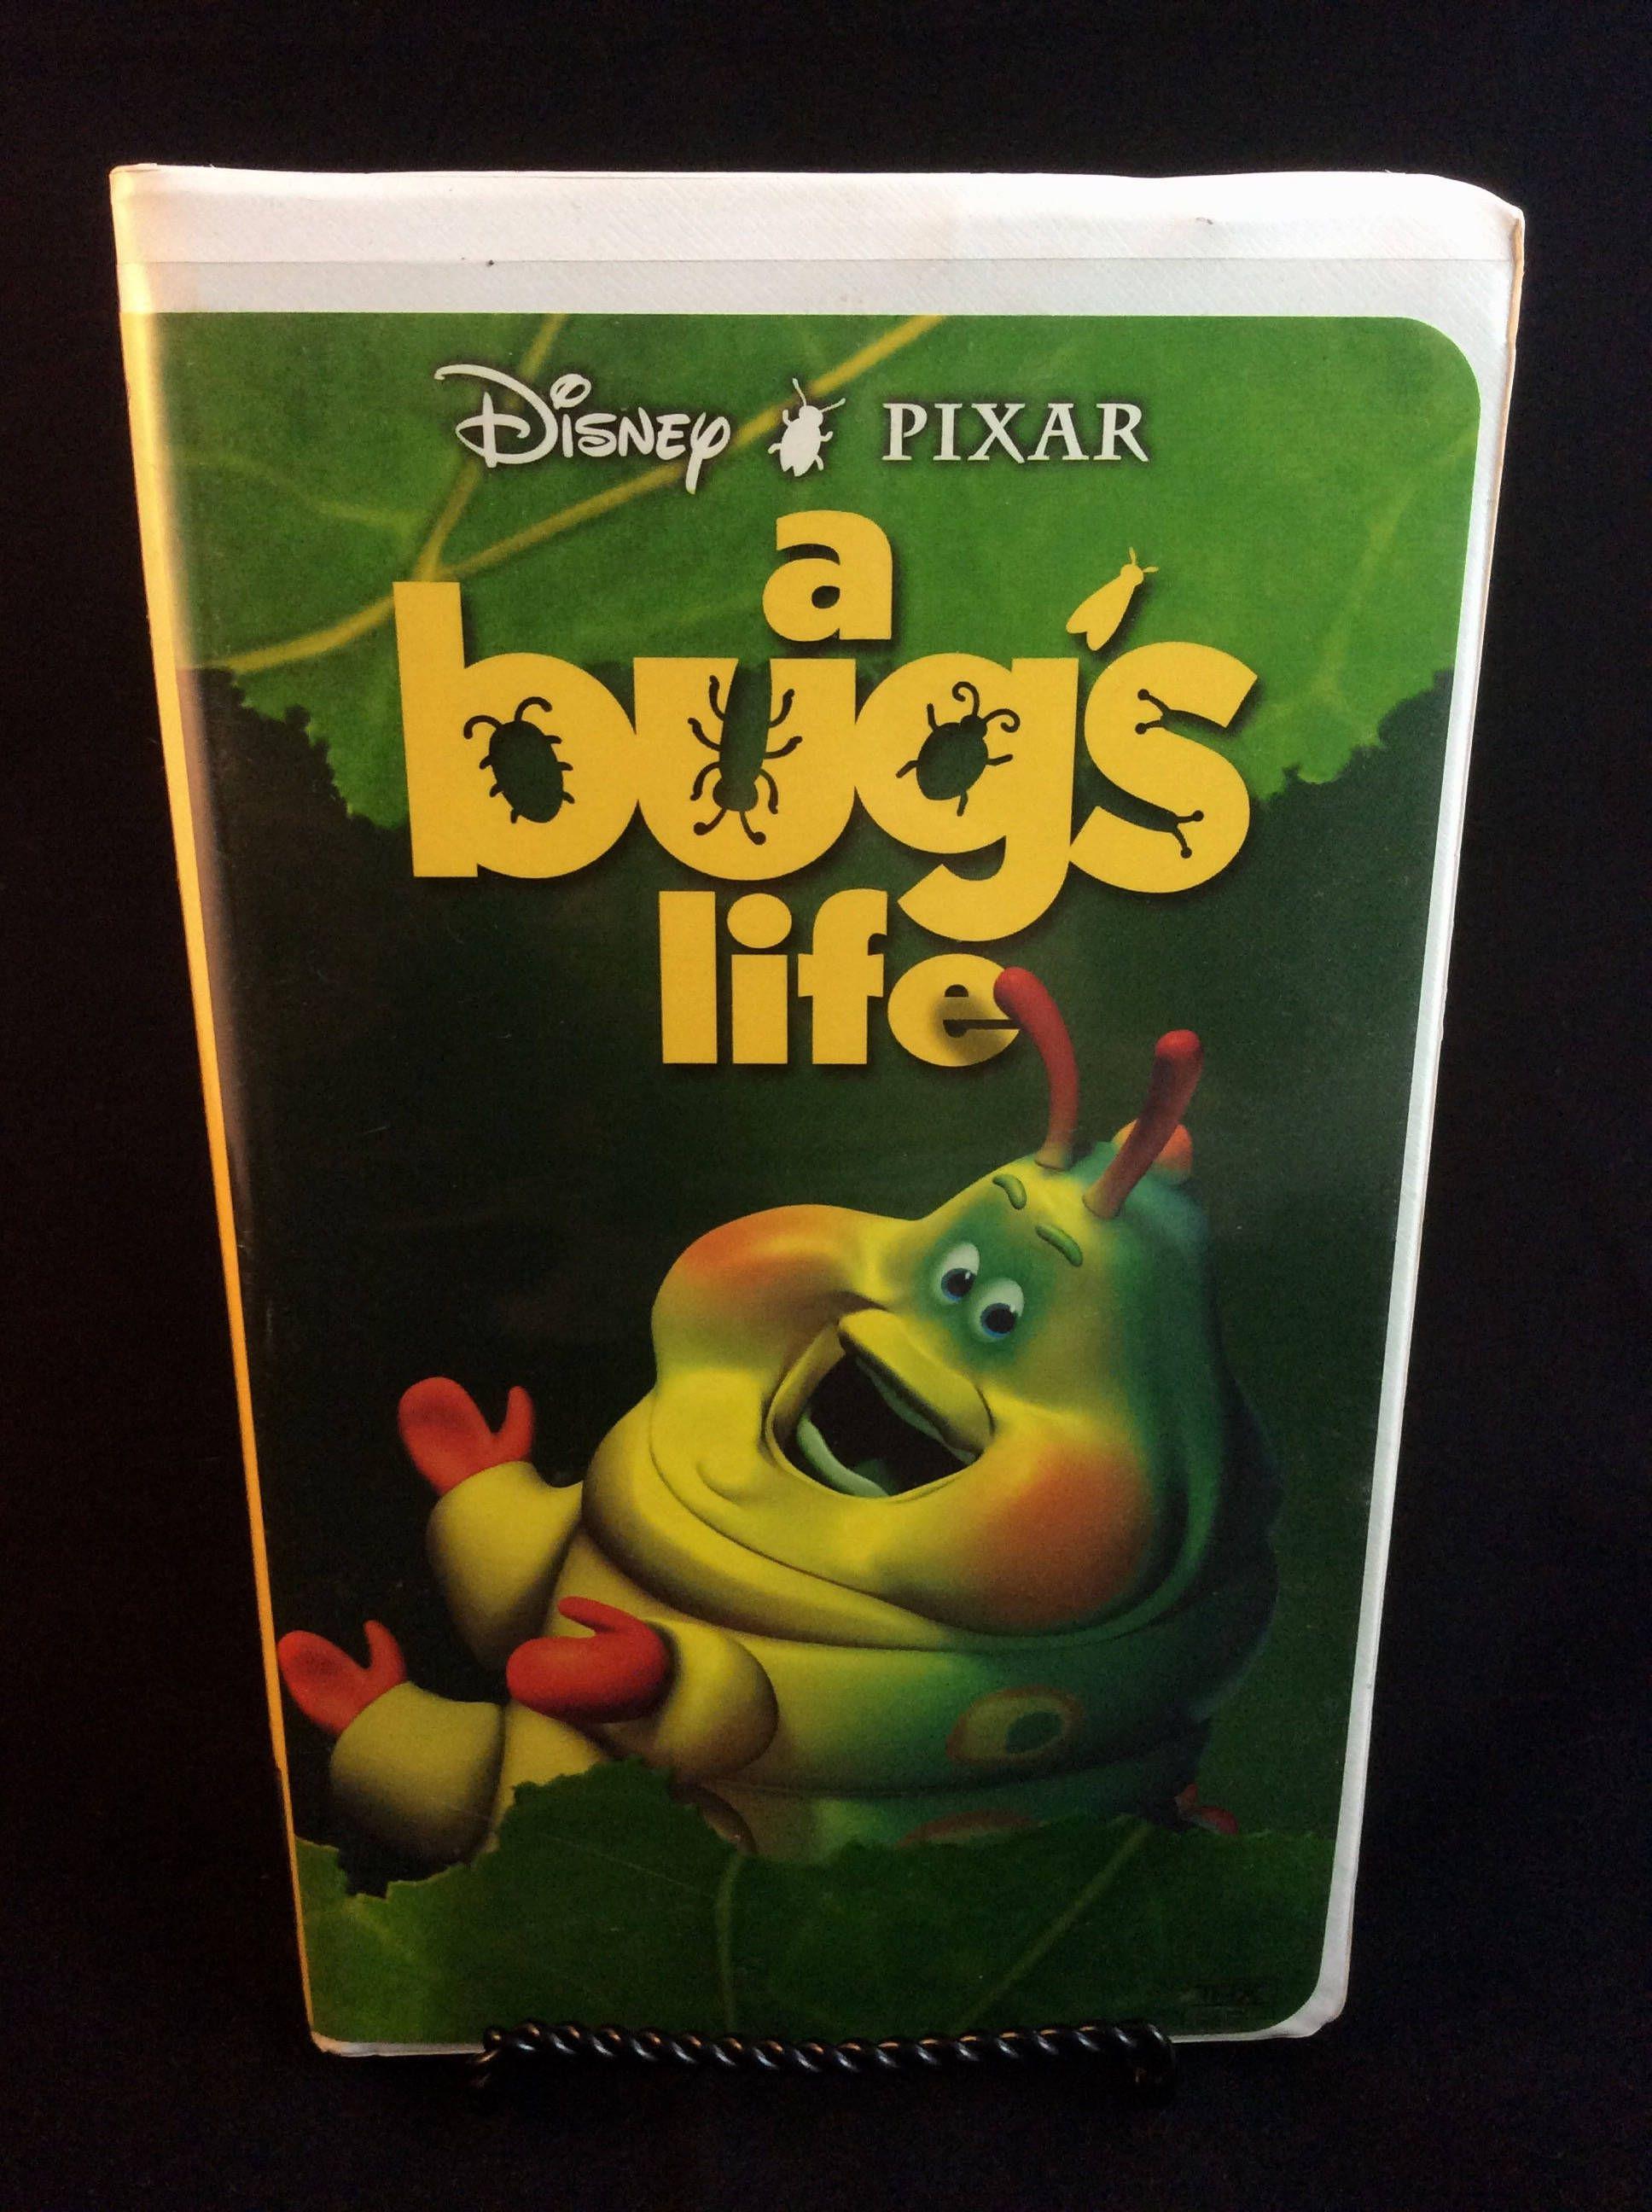 A Bug's Life VHS Tape 90s Disney/Pixar animated movies